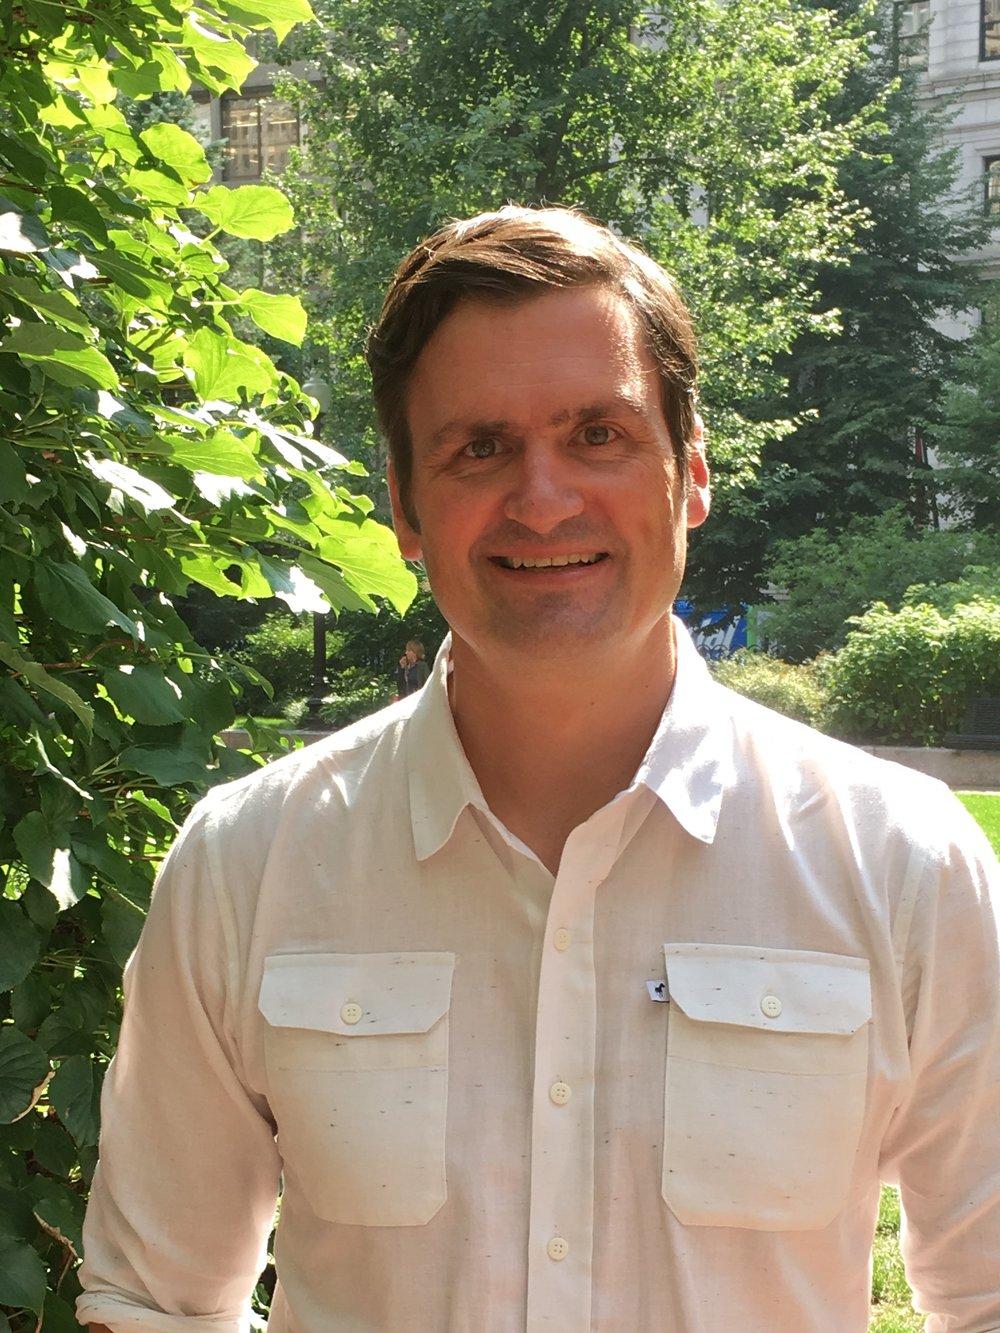 Joe Michie - Higher Education Partnerships